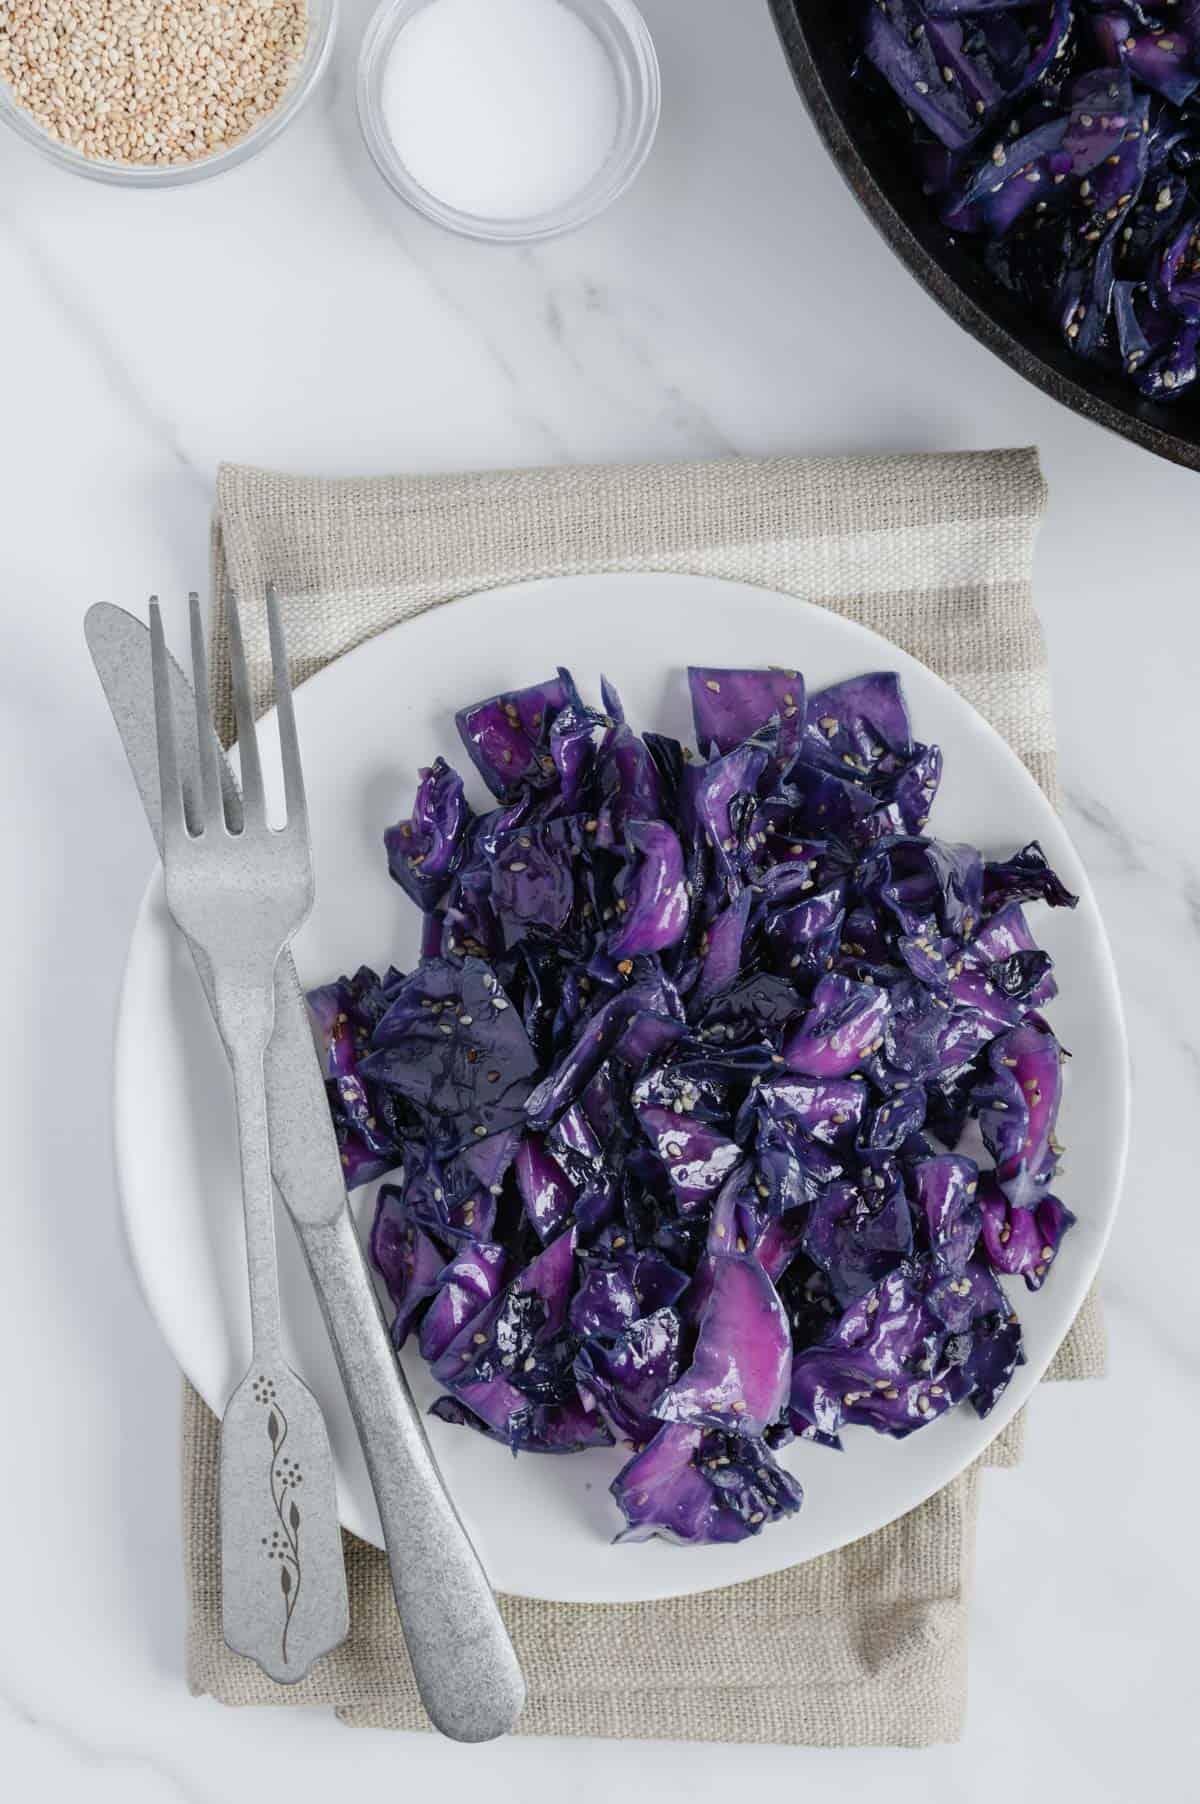 Sauteed Purple Cabbage